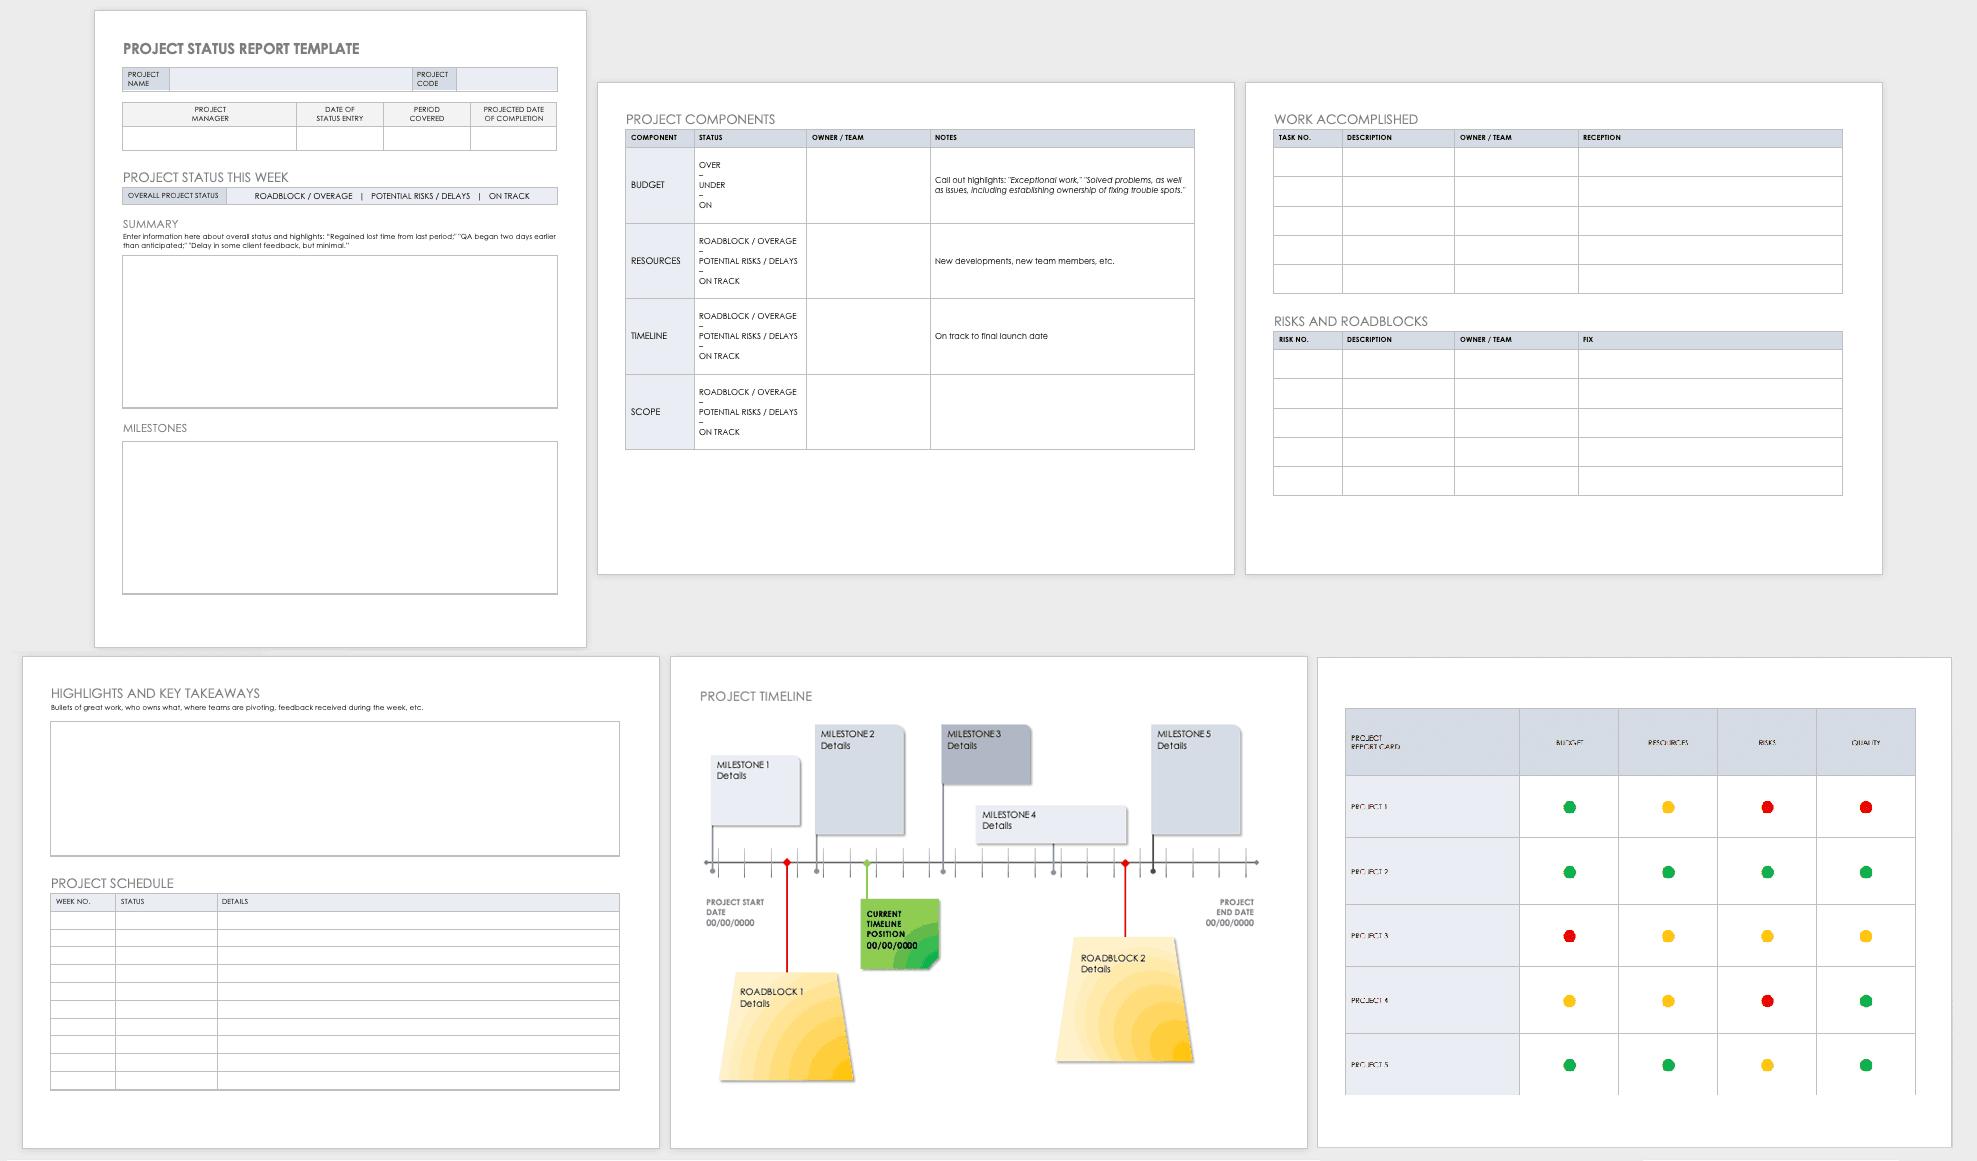 Free Project Report Templates | Smartsheet Within Simple Project Report Template